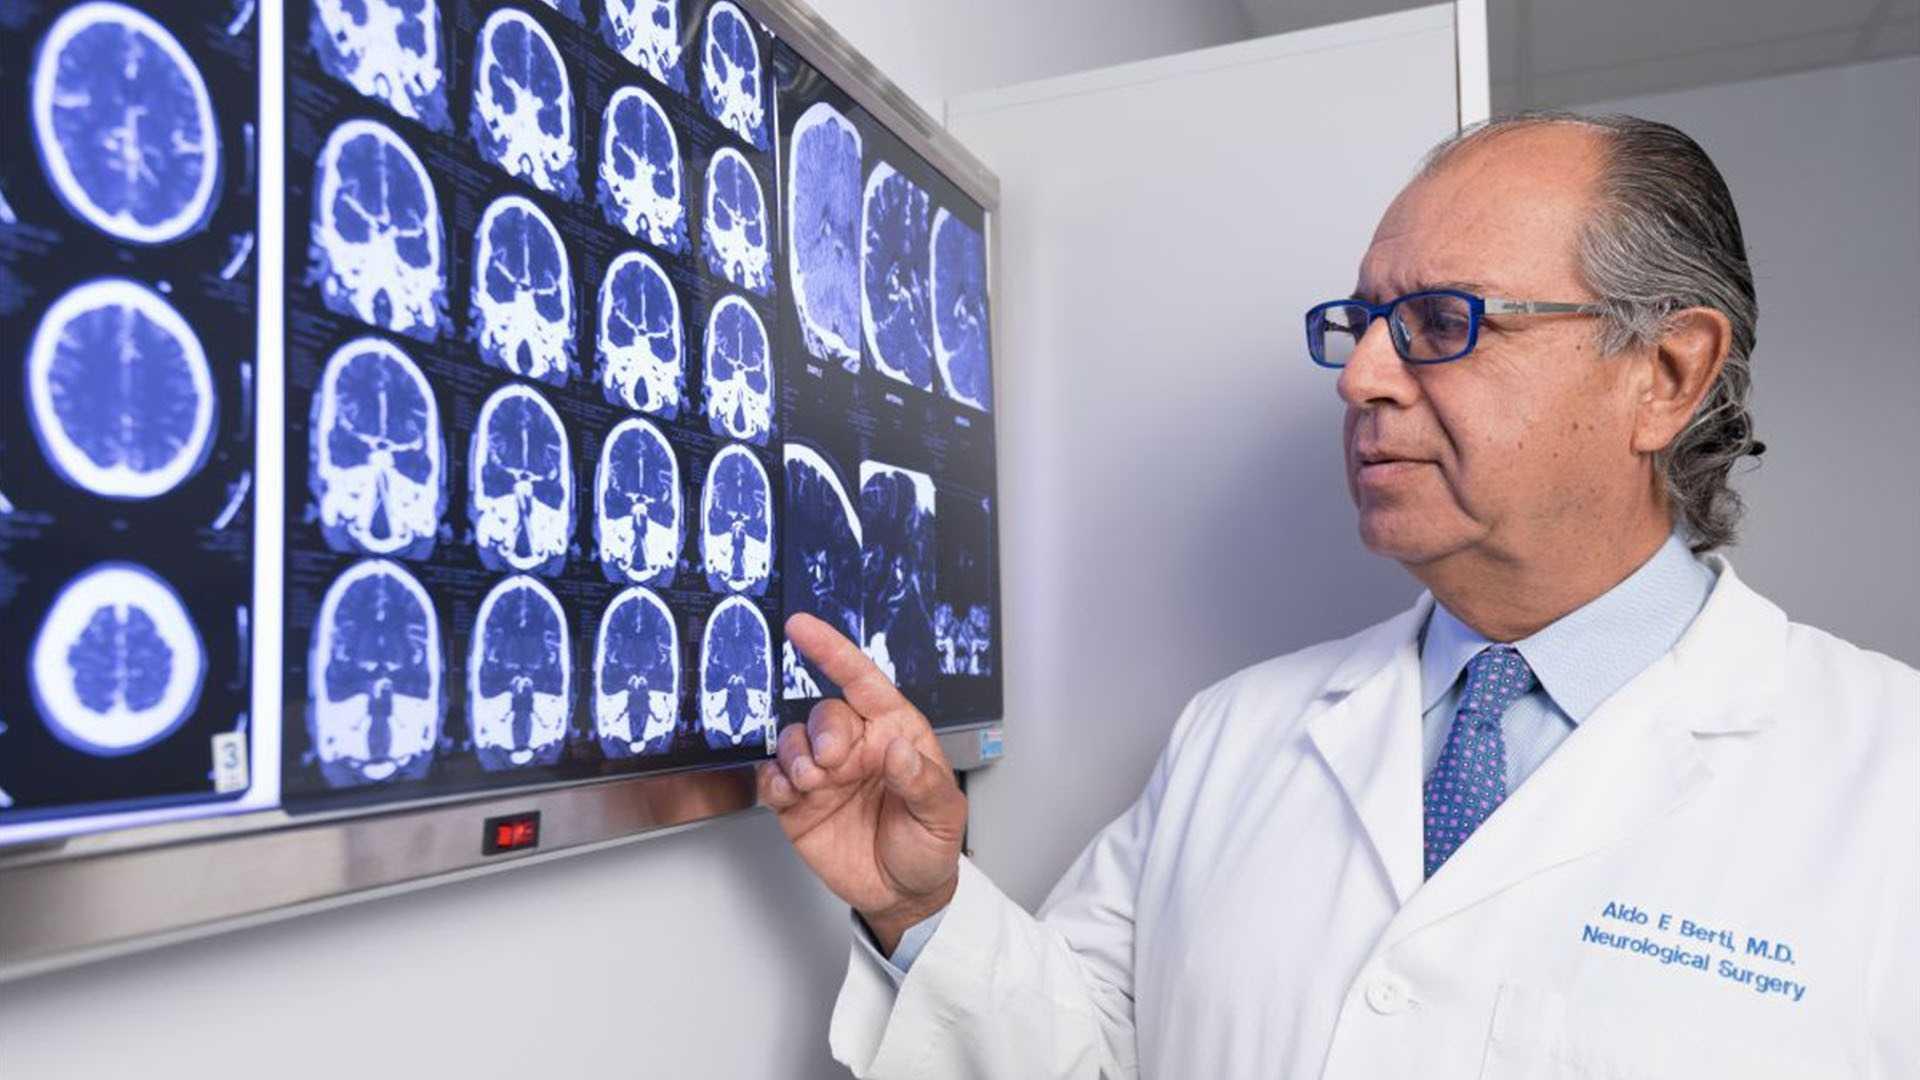 doctor de gamma knife analizando una radiografia del cerebro